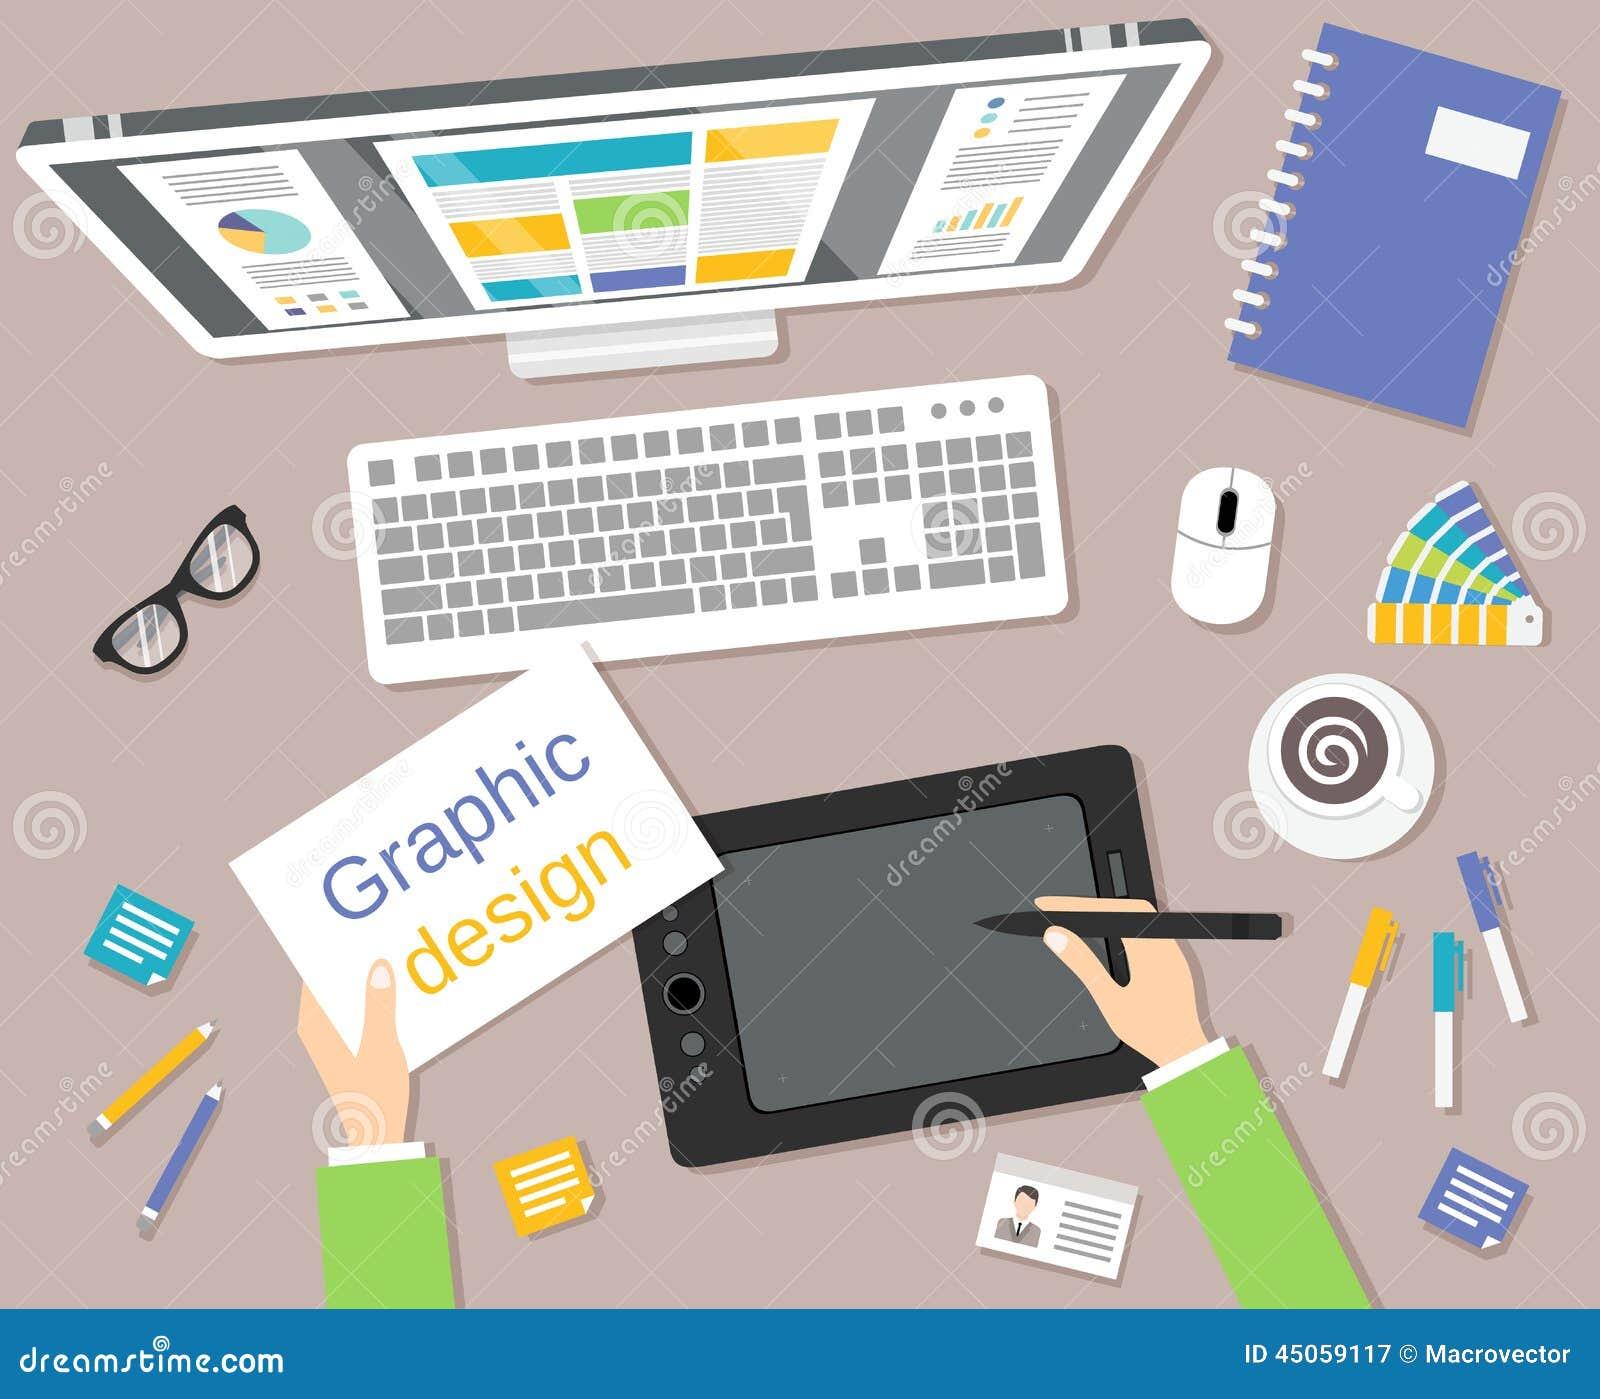 Famous graphic designers and illustrators